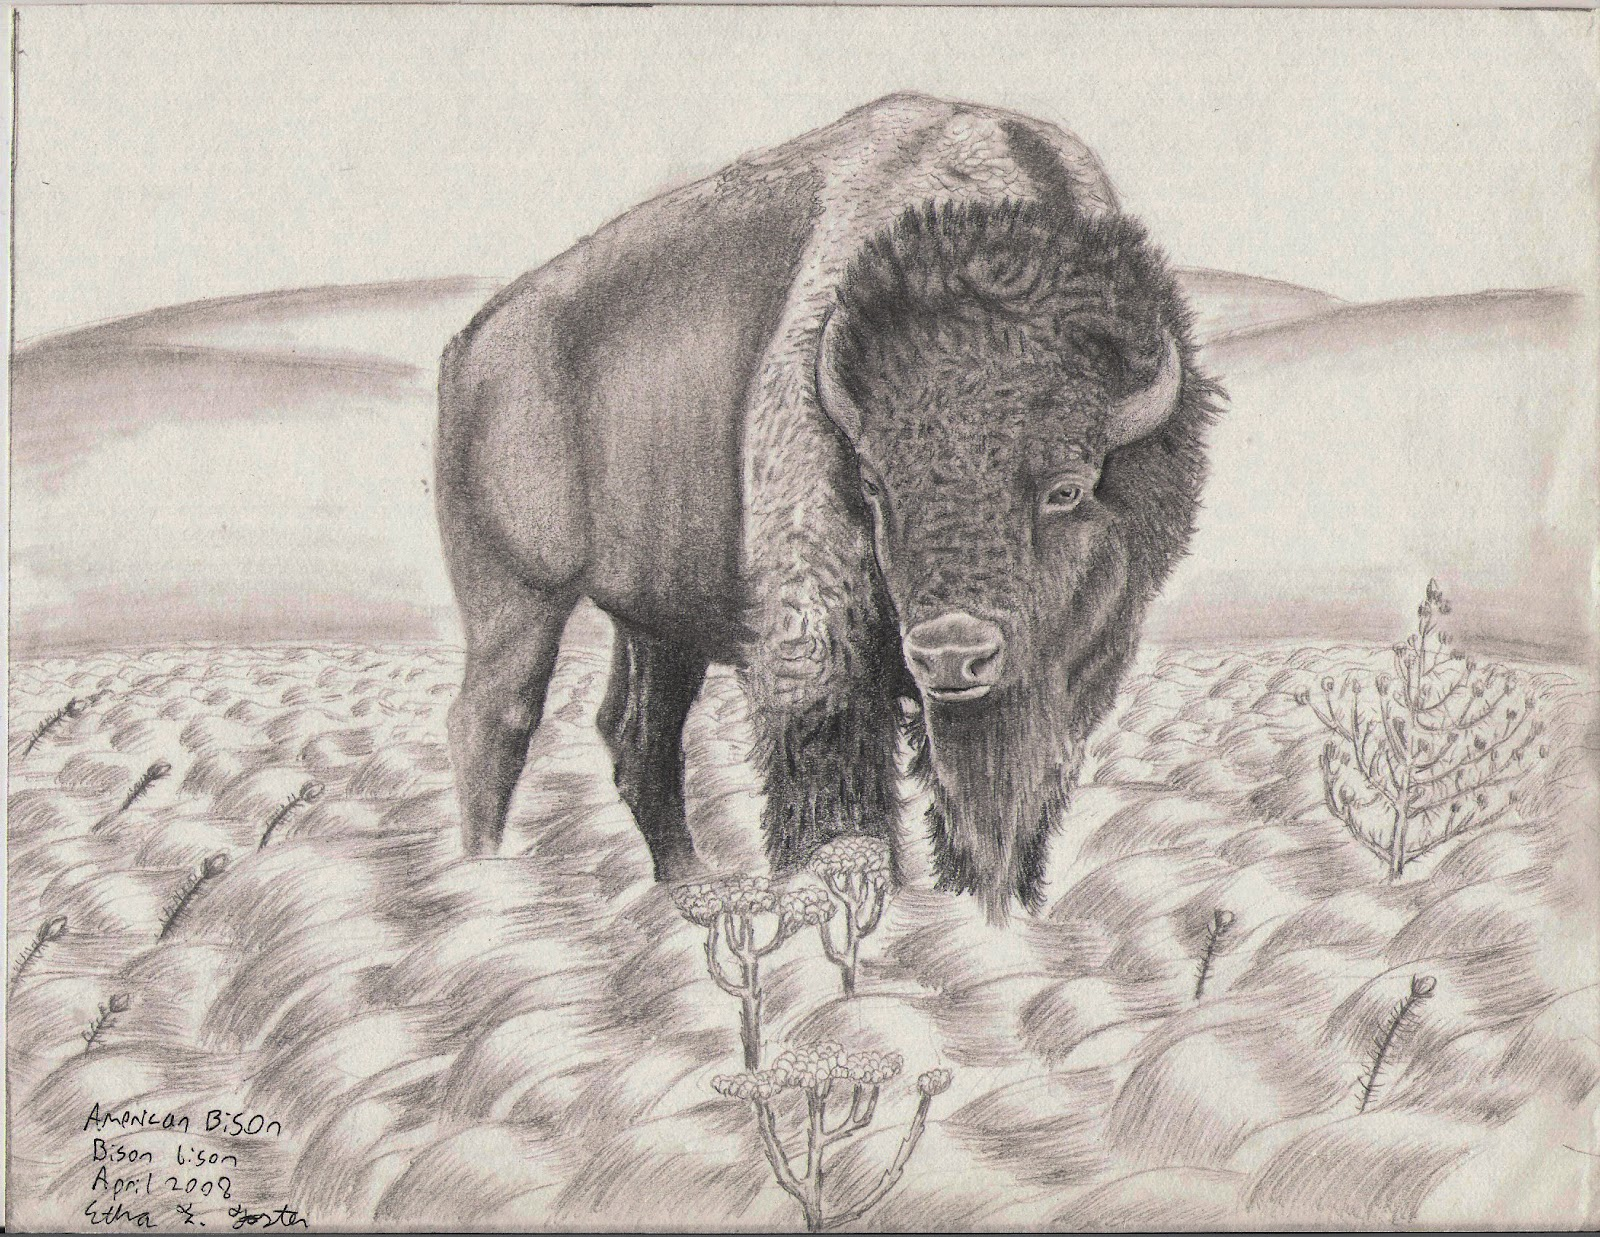 American bison pencil drawing in h hb b3 pencil